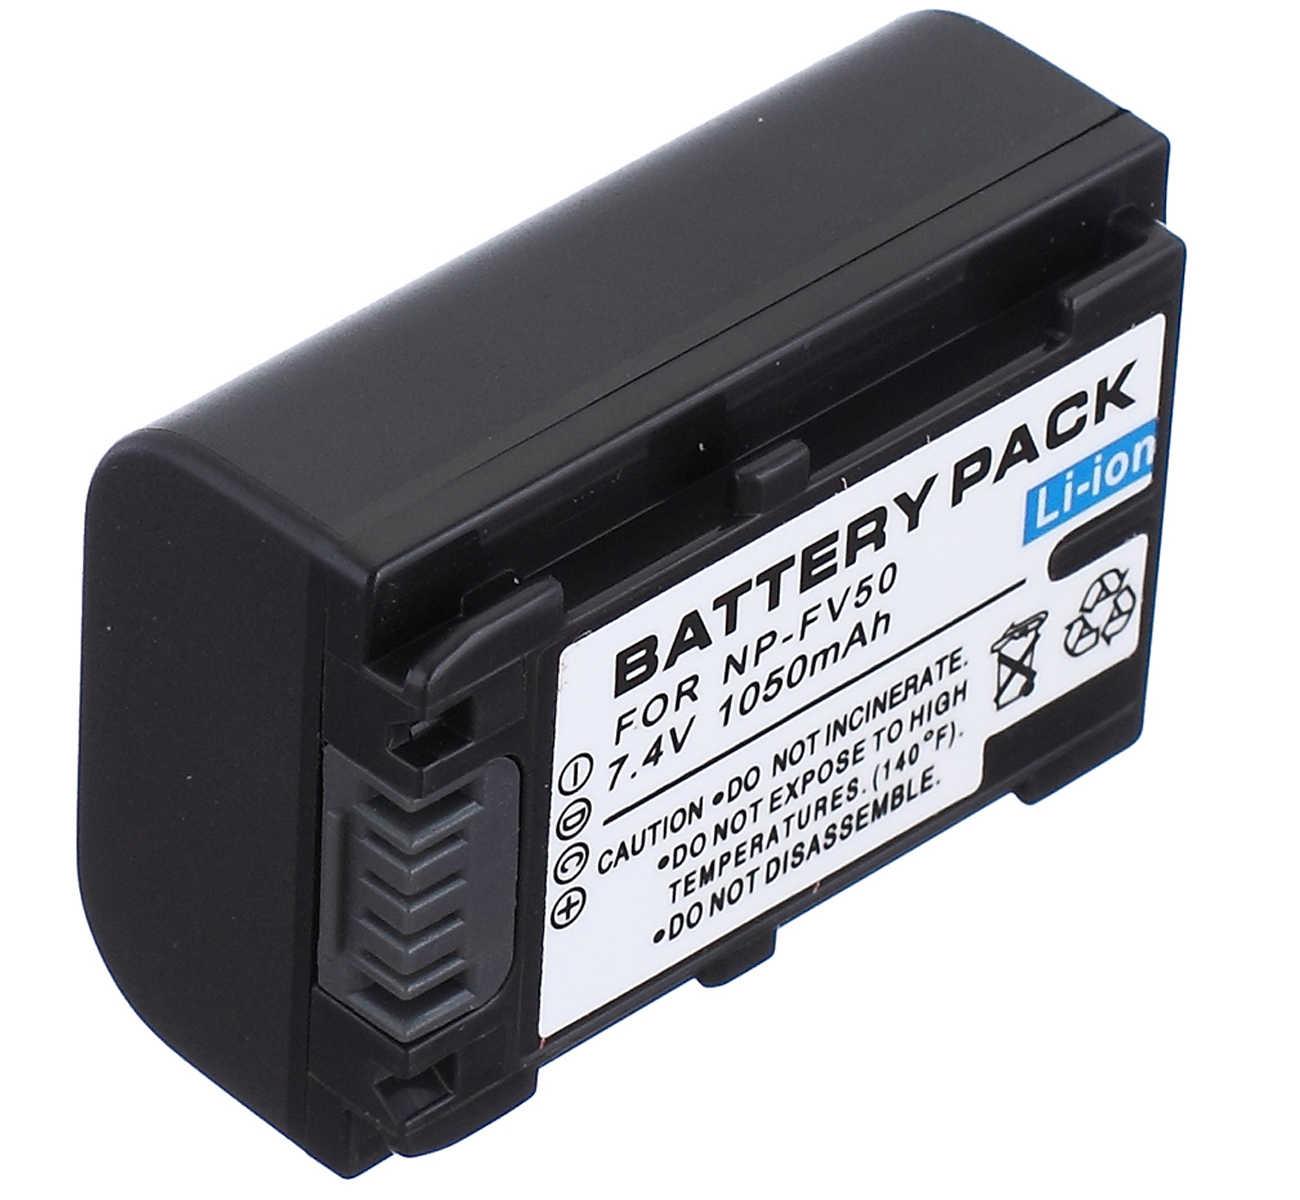 DCR-SX20 Battery Pack for Sony DCR-SX15 DCR-SX21 DCR-SX22 Handycam Camcorder